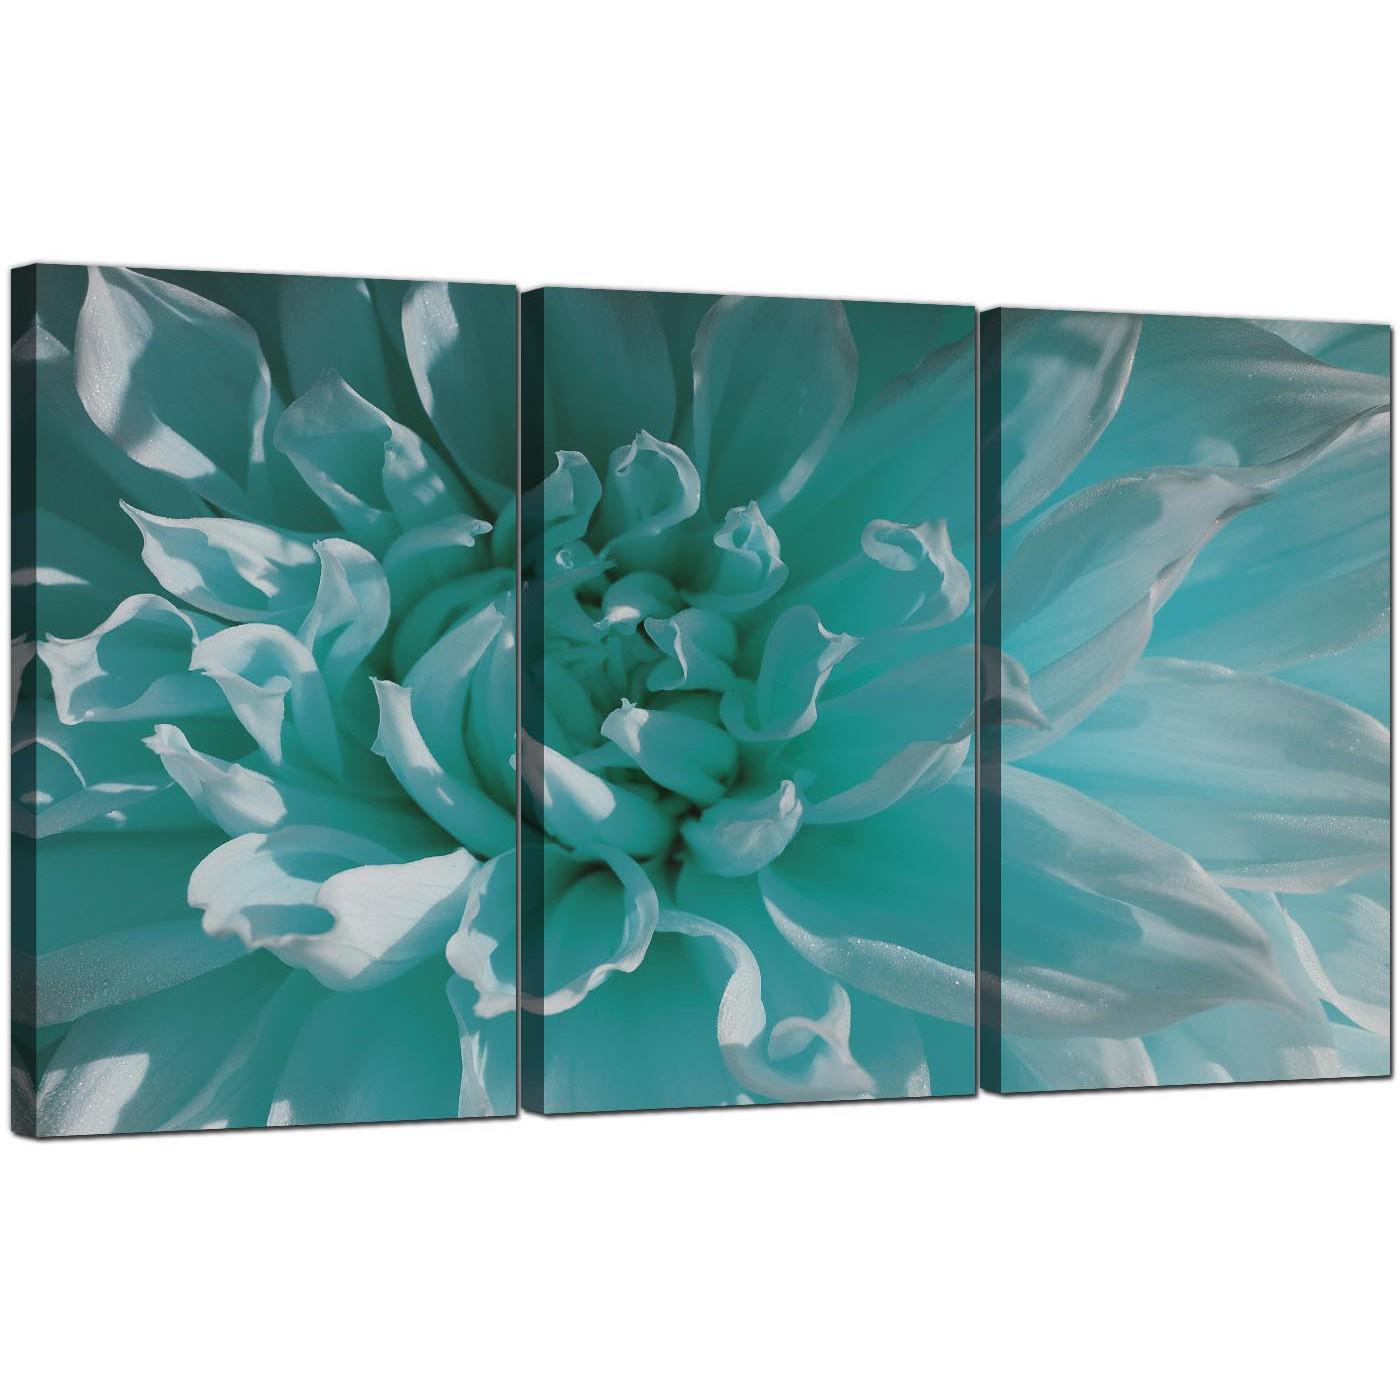 Awesome Bathroom Canvas Gallery Best Image Engine chizmososcom